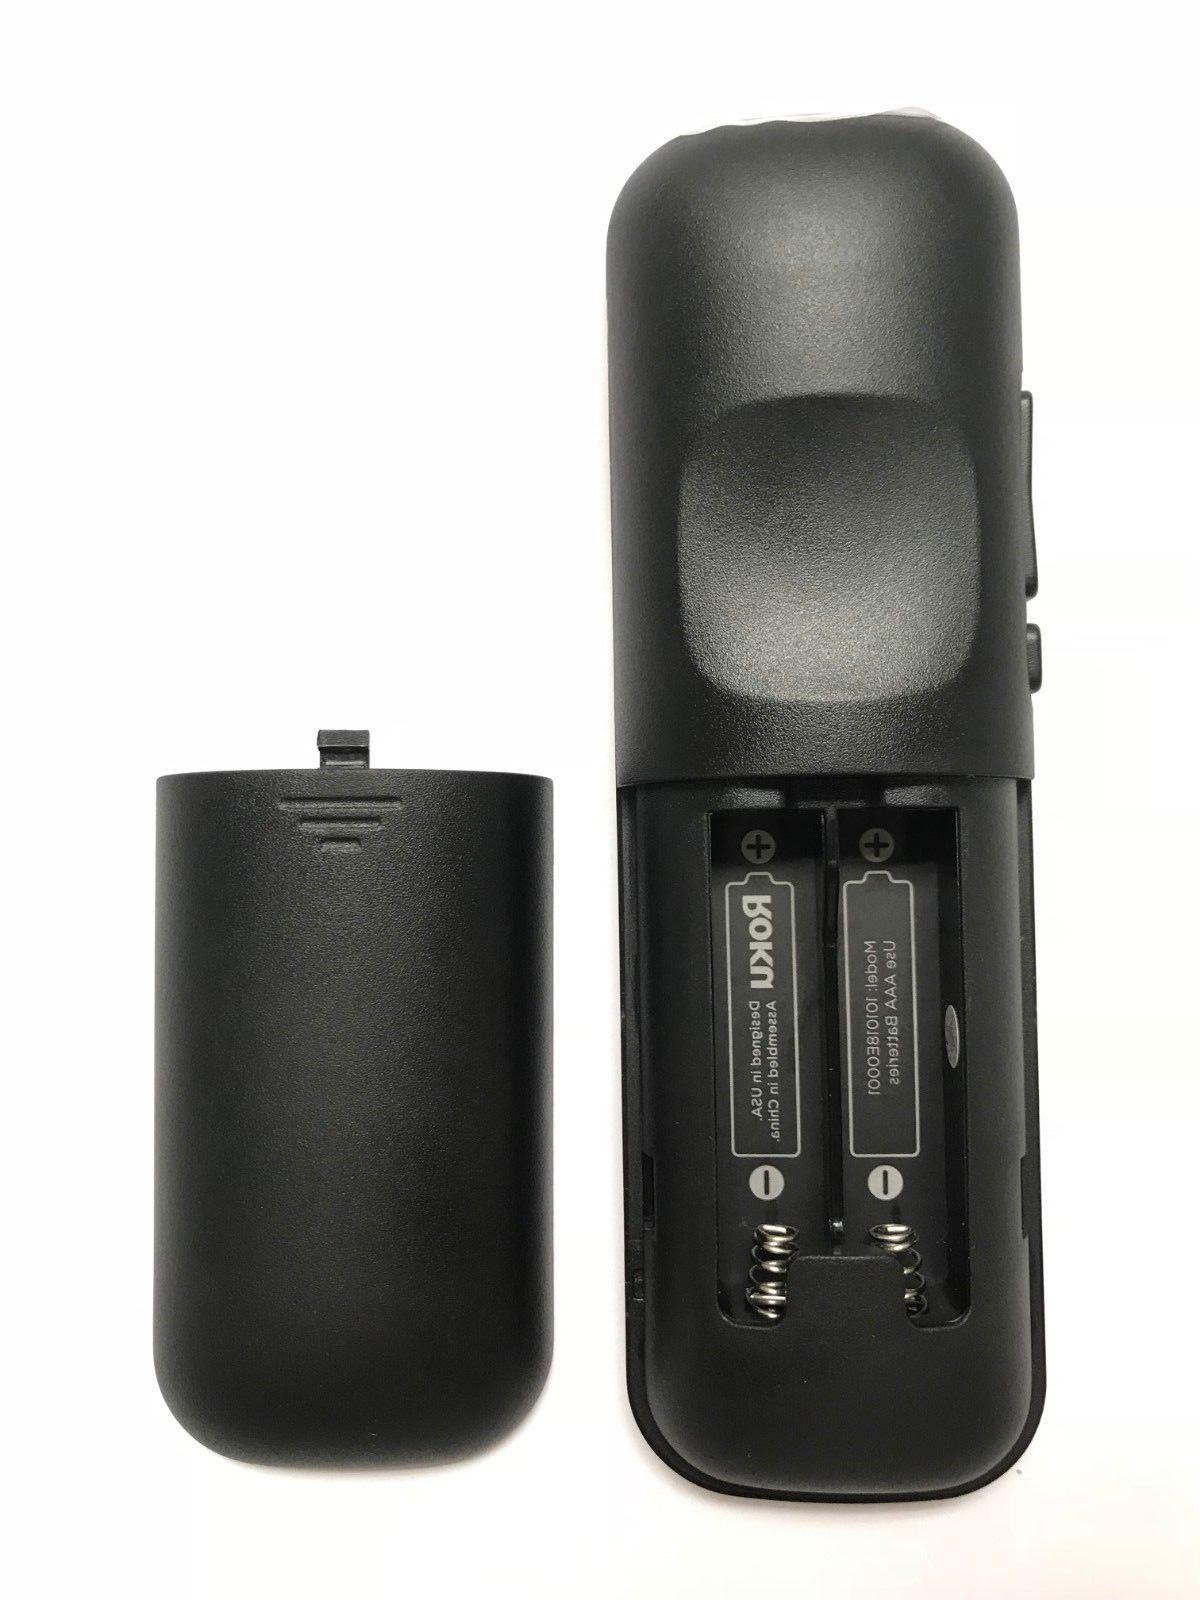 TV Remote w/ TV Power Control